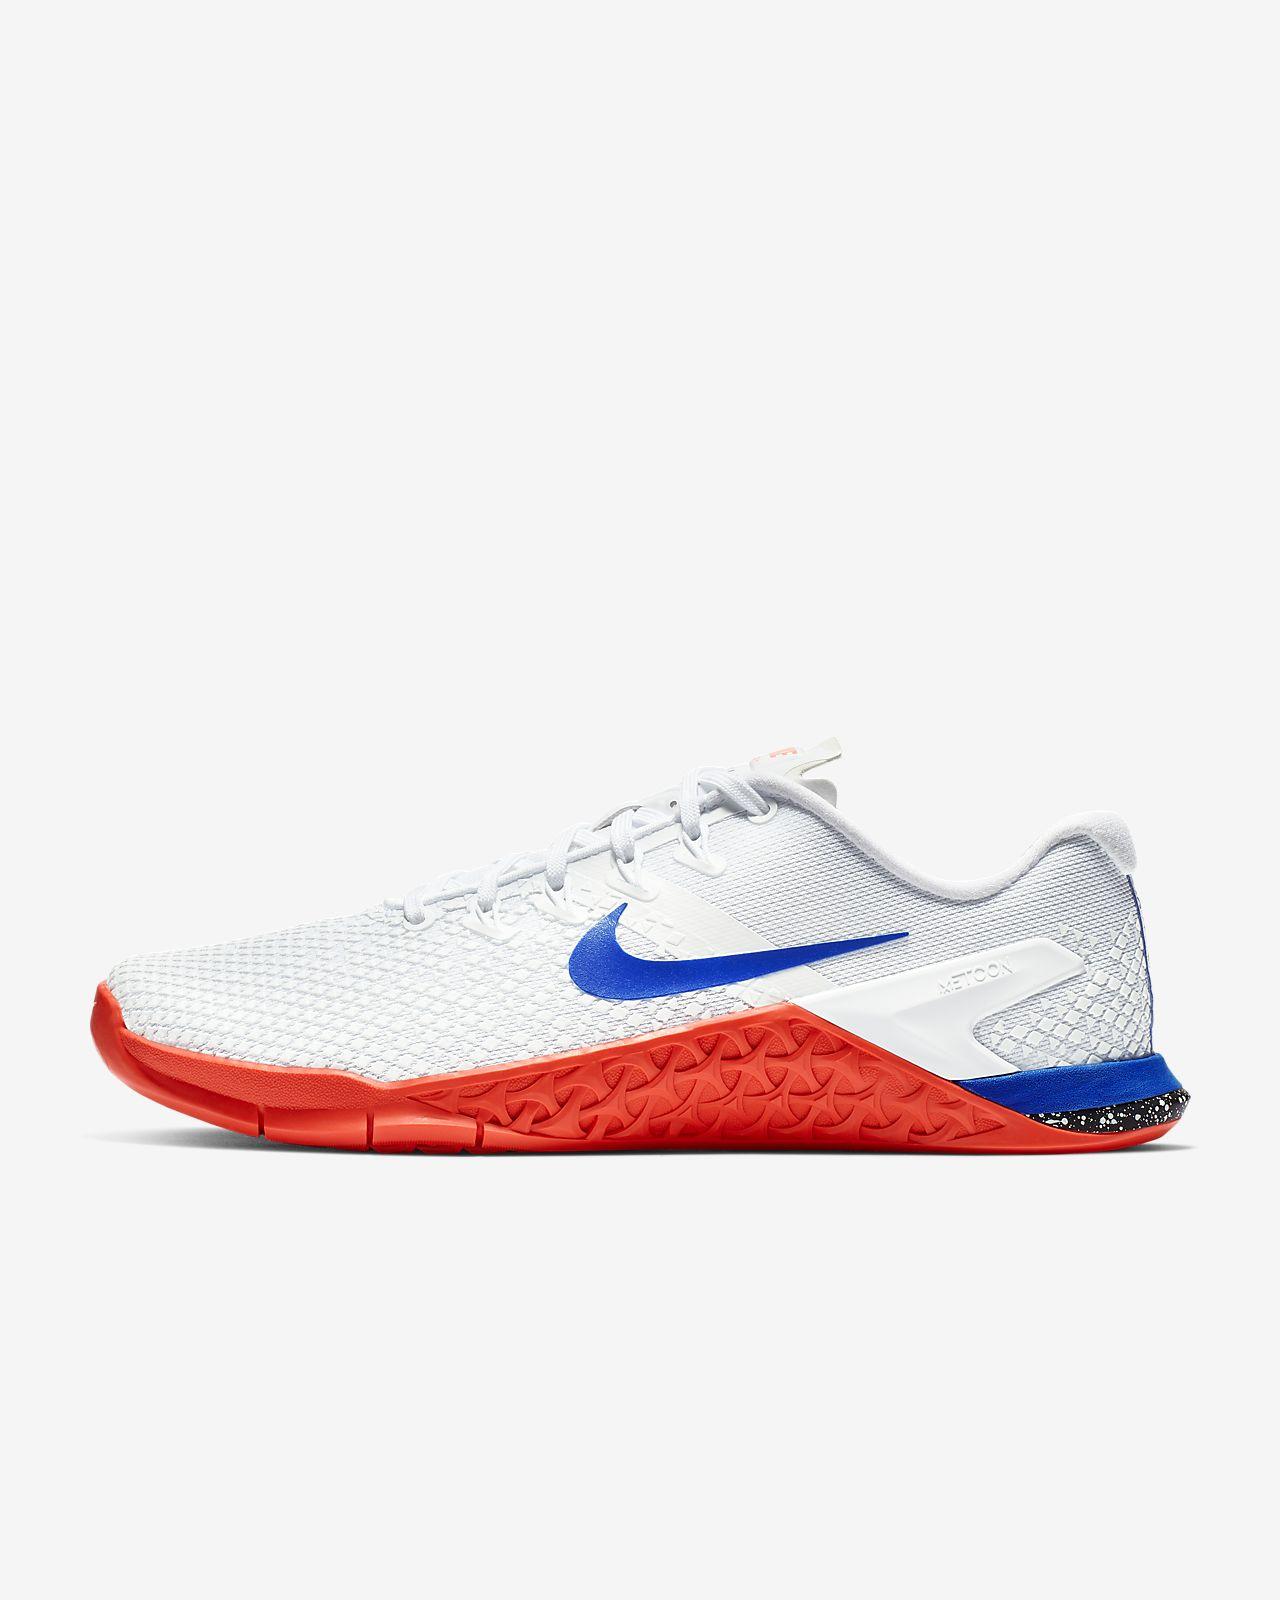 Metcon Donna Scarpa 4 Xd Pesi Da Trainingsollevamento Cross Nike wfTxpfXq